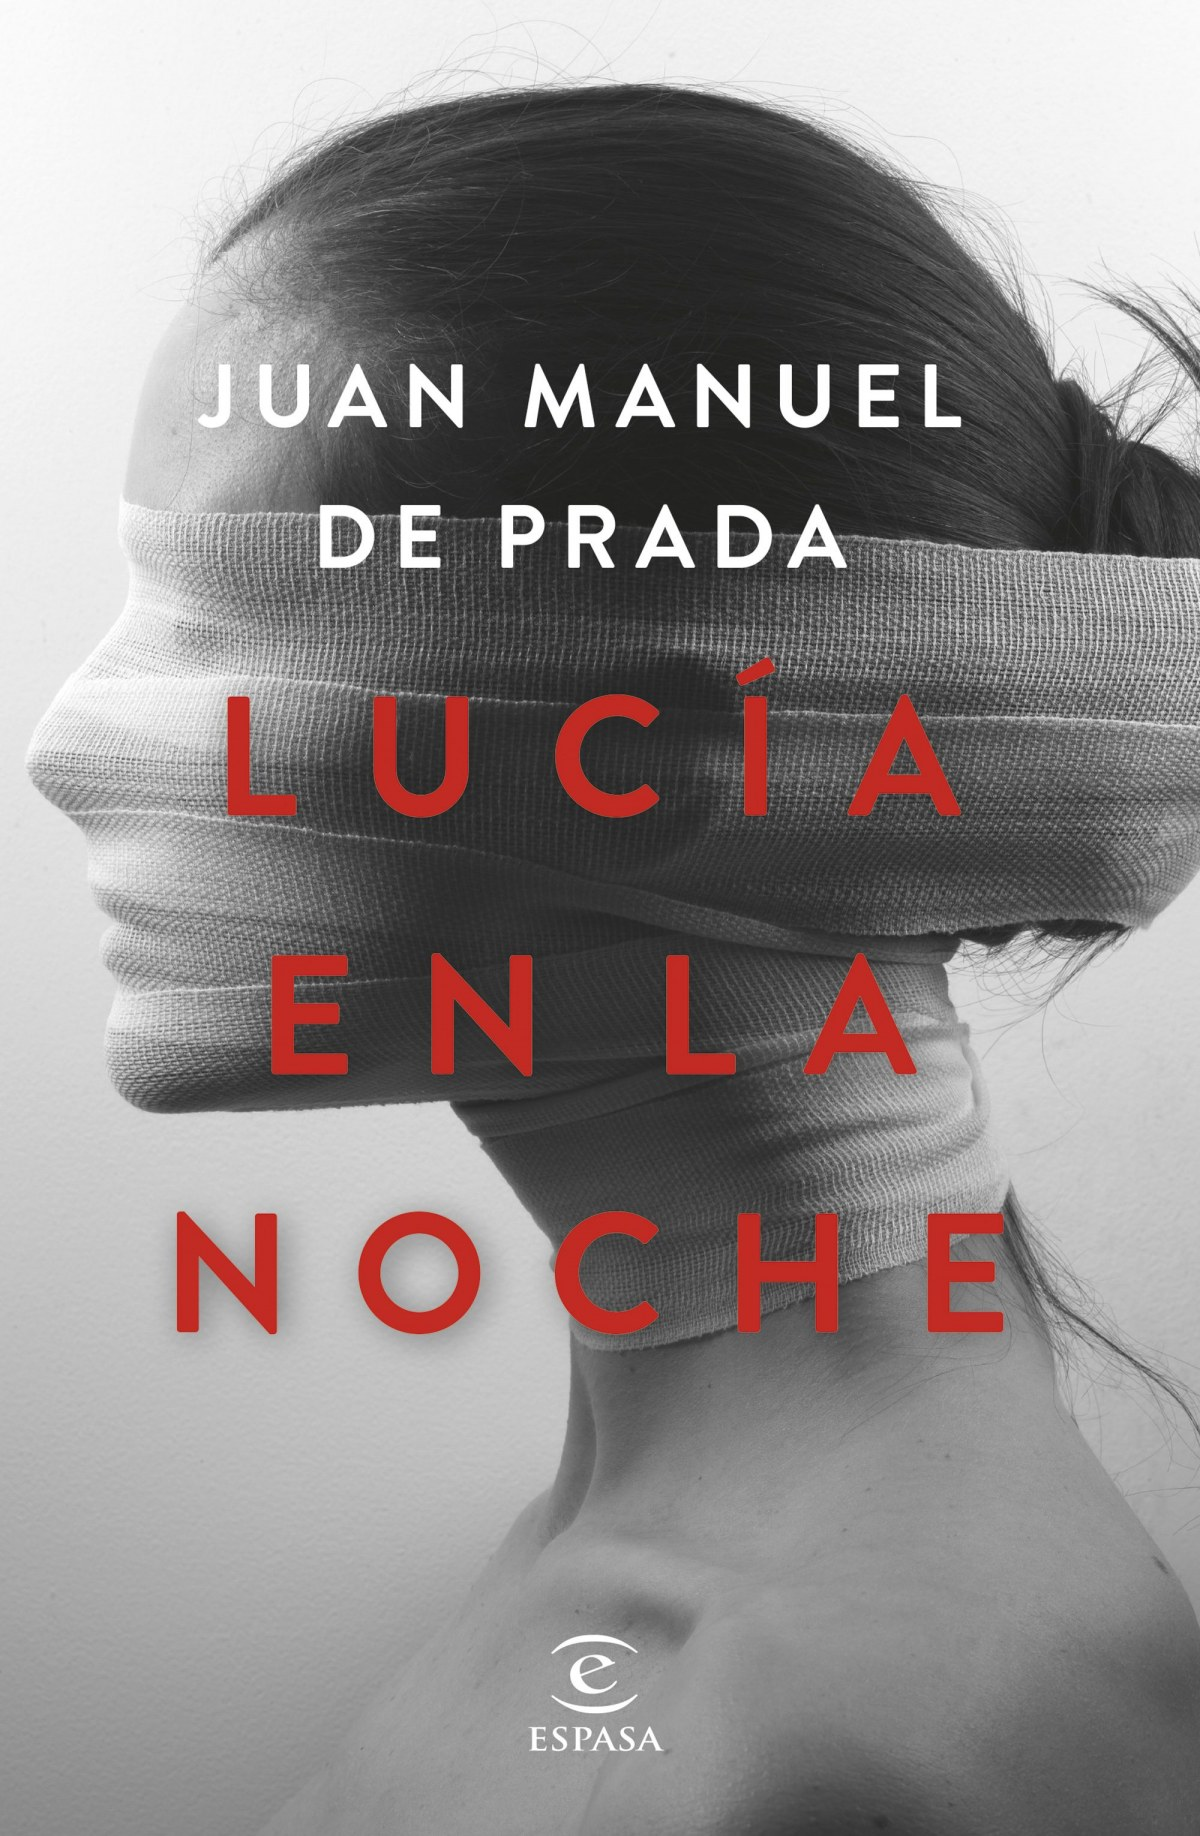 LUCIA EN LA NOCHE 9788467054286